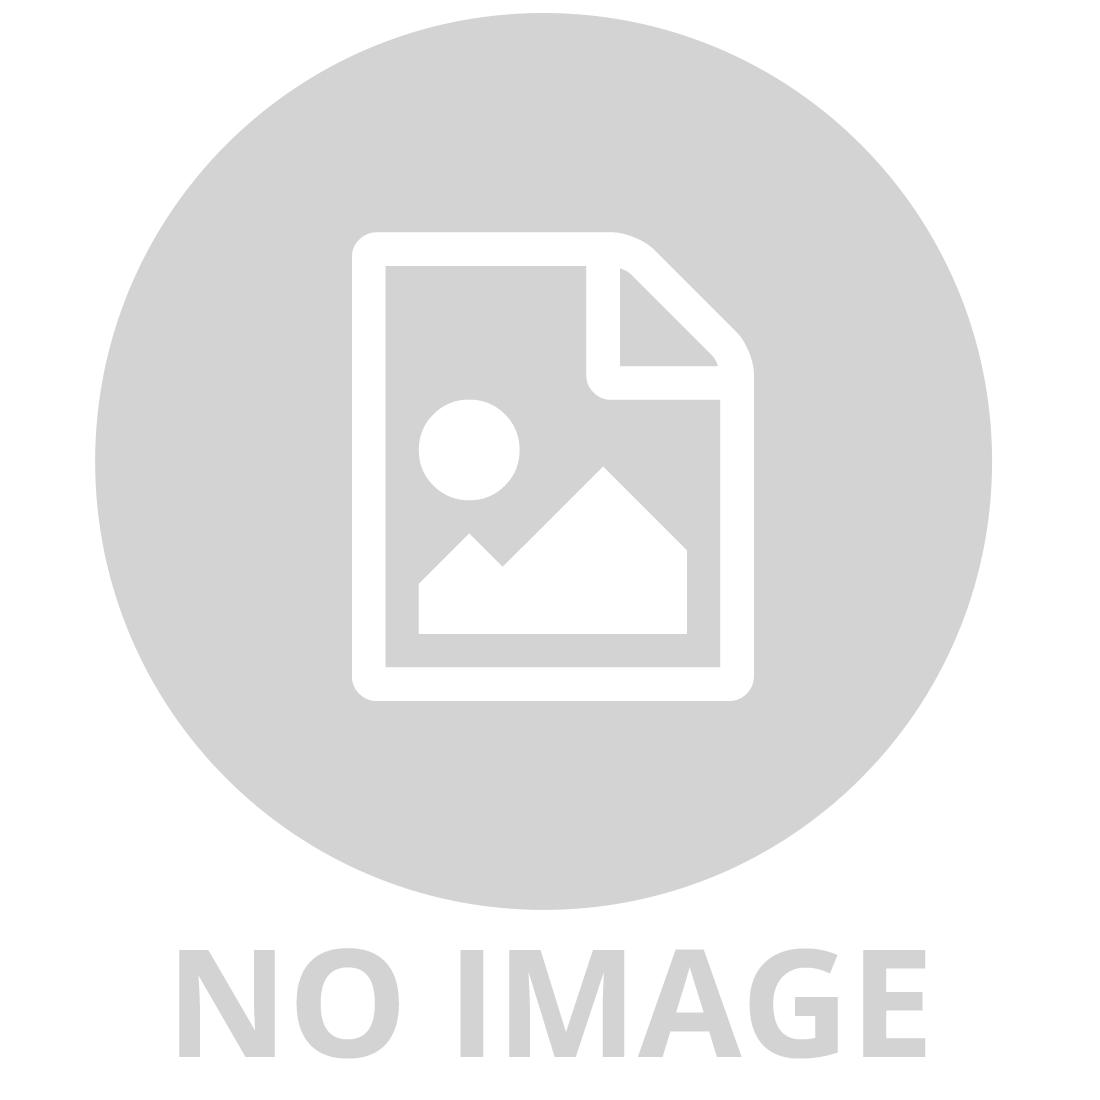 RAVENSBURGER DISNEY TWO CAR PUZZLE